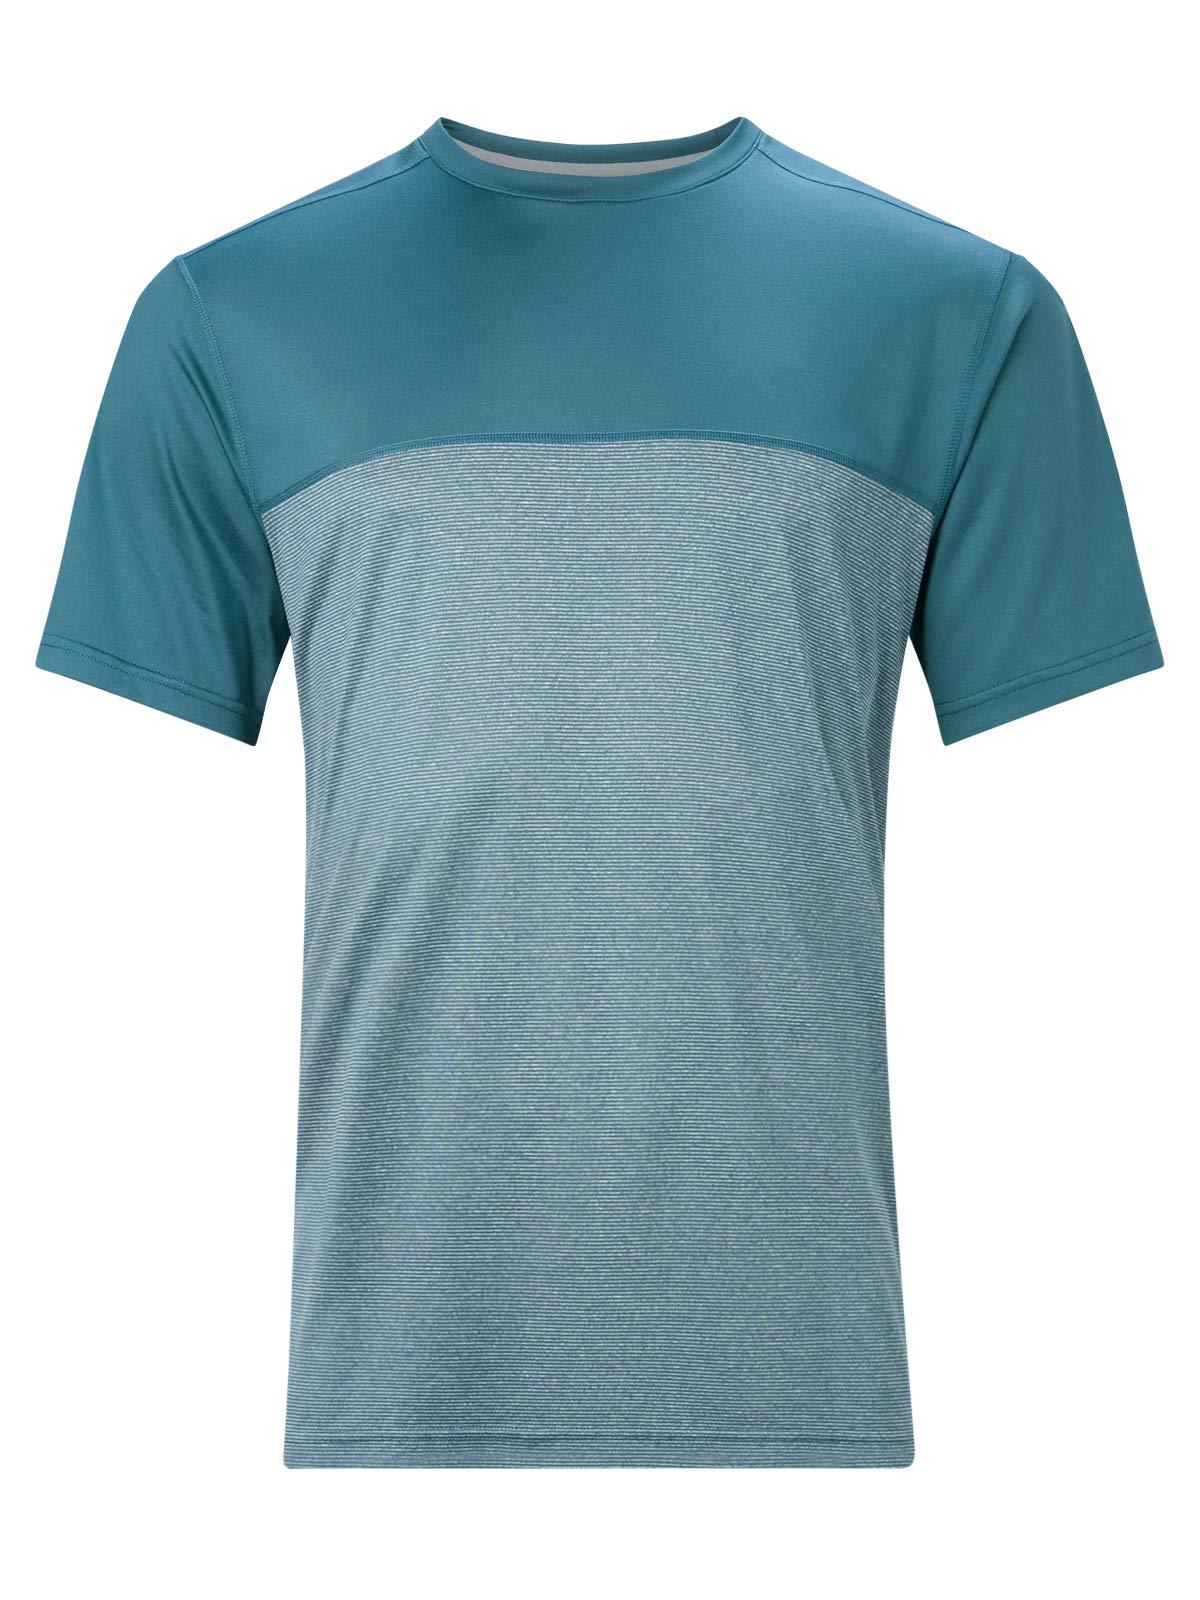 Berghaus Damen Voyager Base Layer Short Sleeve T-Shirt, Rauchsignal, M